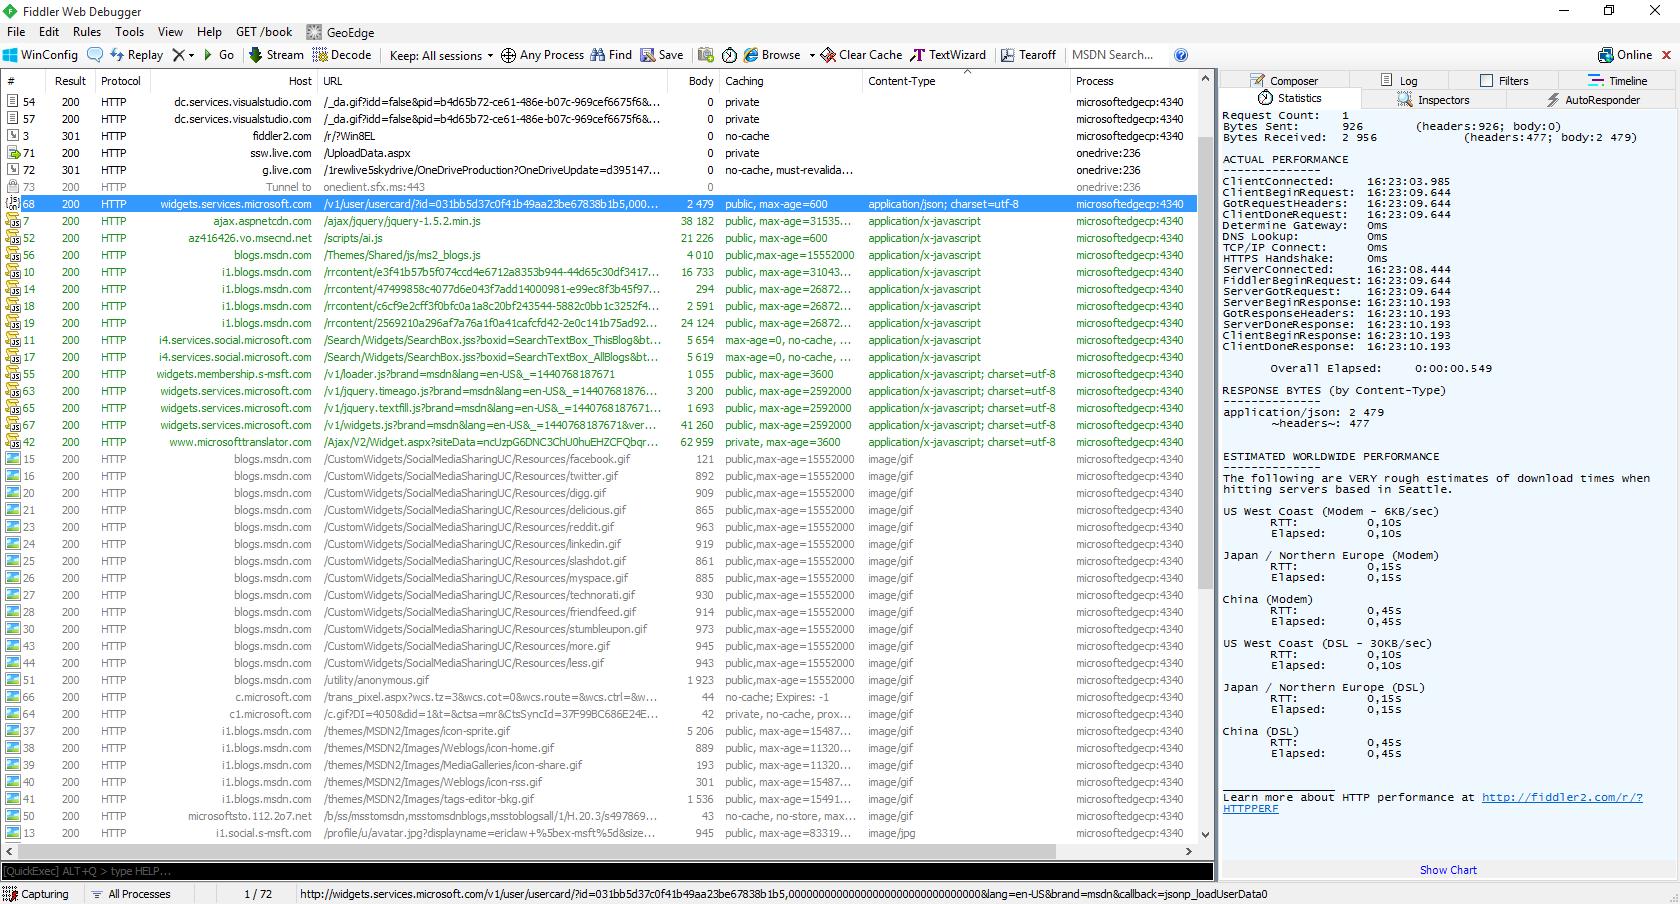 Фрагмент лога HTTP-прокси